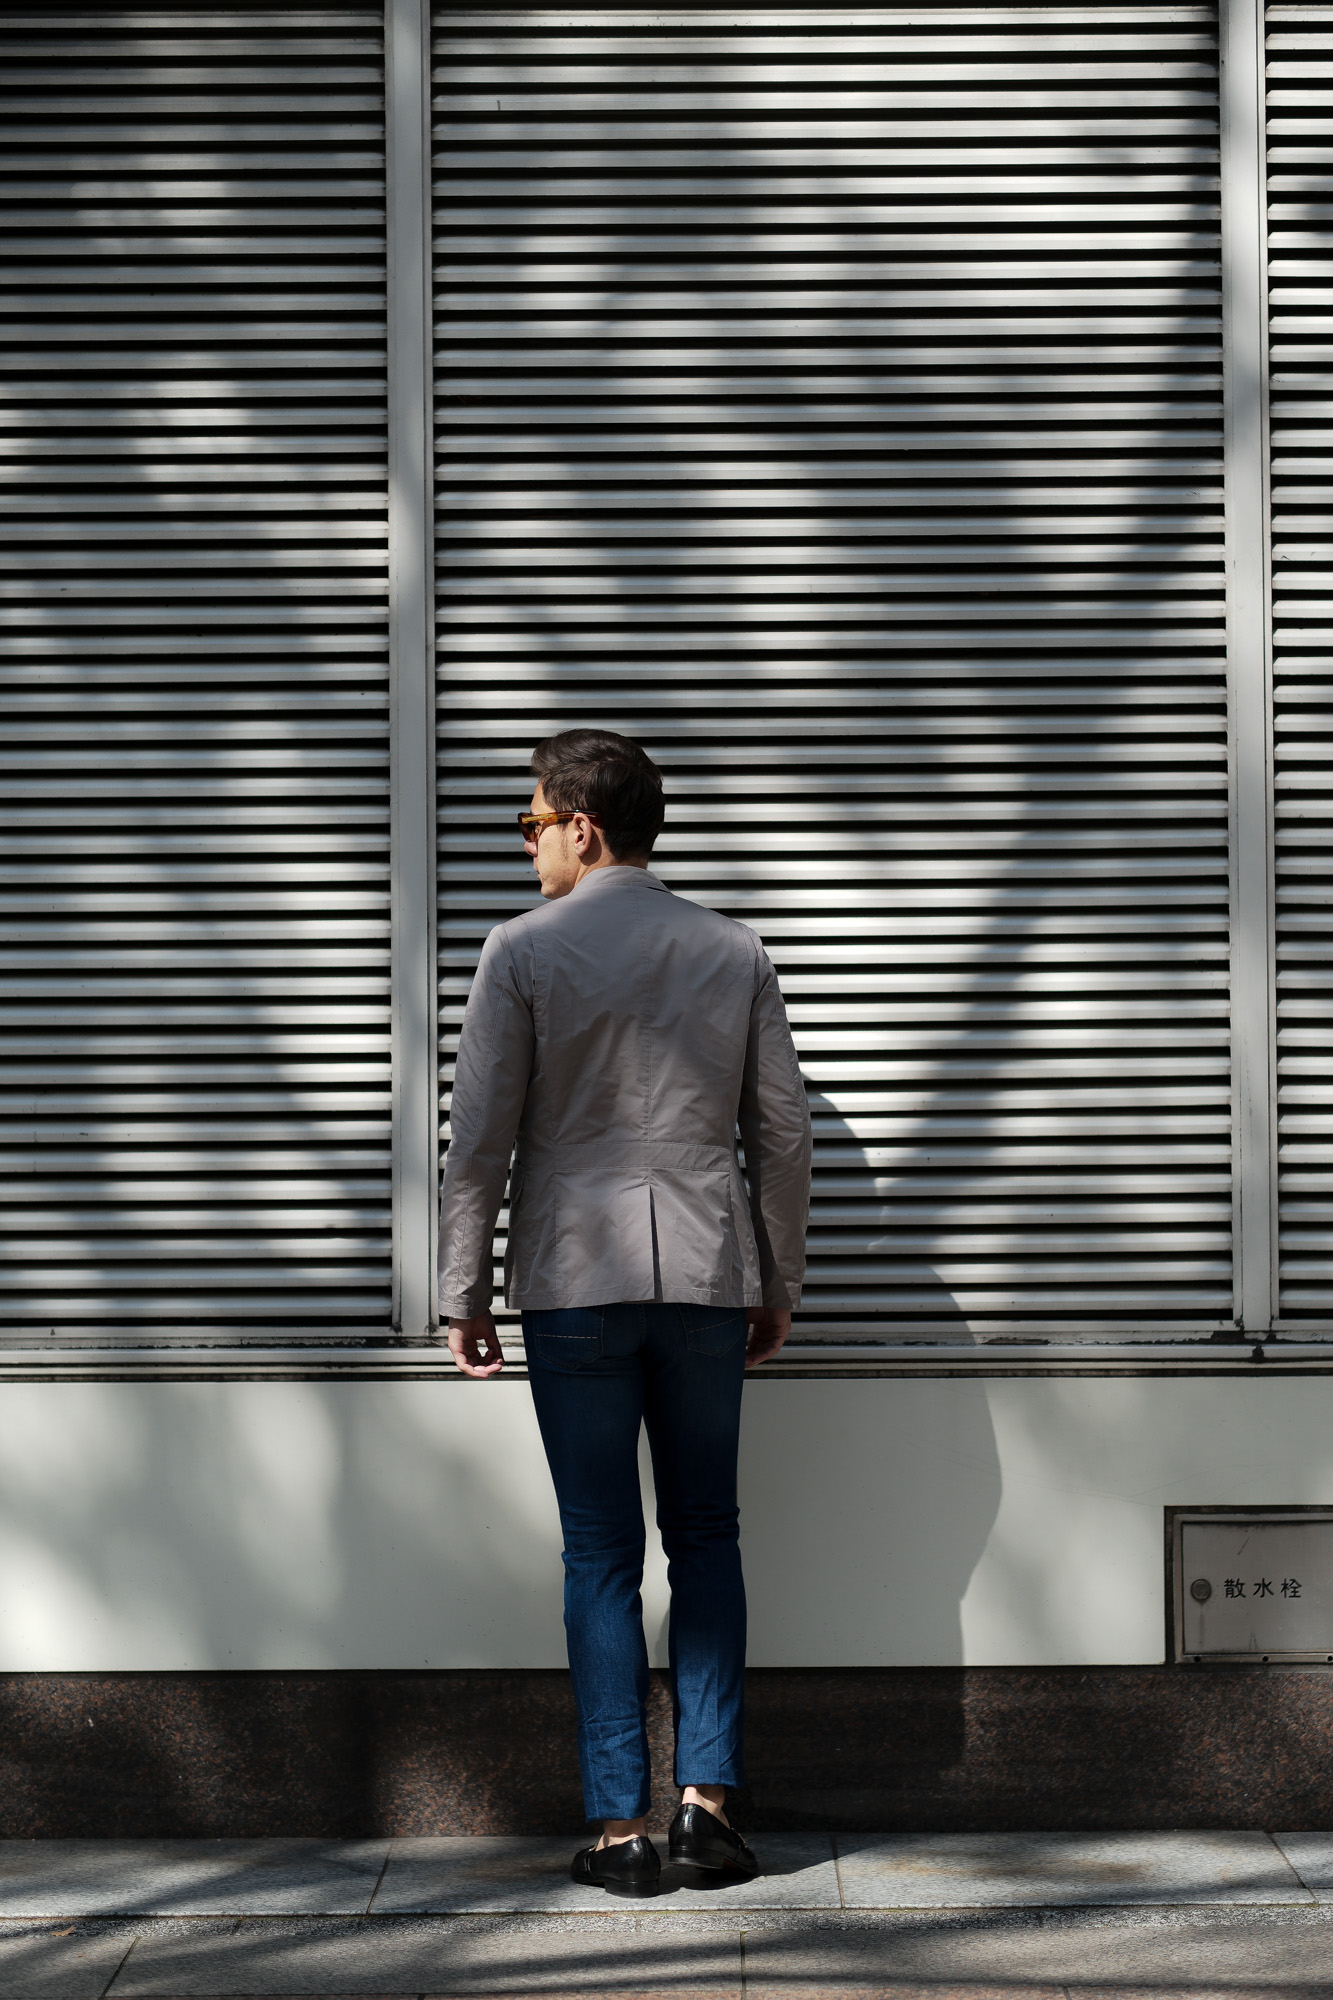 MOORER(ムーレー) GHIBERTI-KM1 (ギベルティ) ナイロン シングル ジャケット MARMO (グレー) Made in italy (イタリア製) 2020 春夏新作 愛知 名古屋 altoediritto アルトエデリット